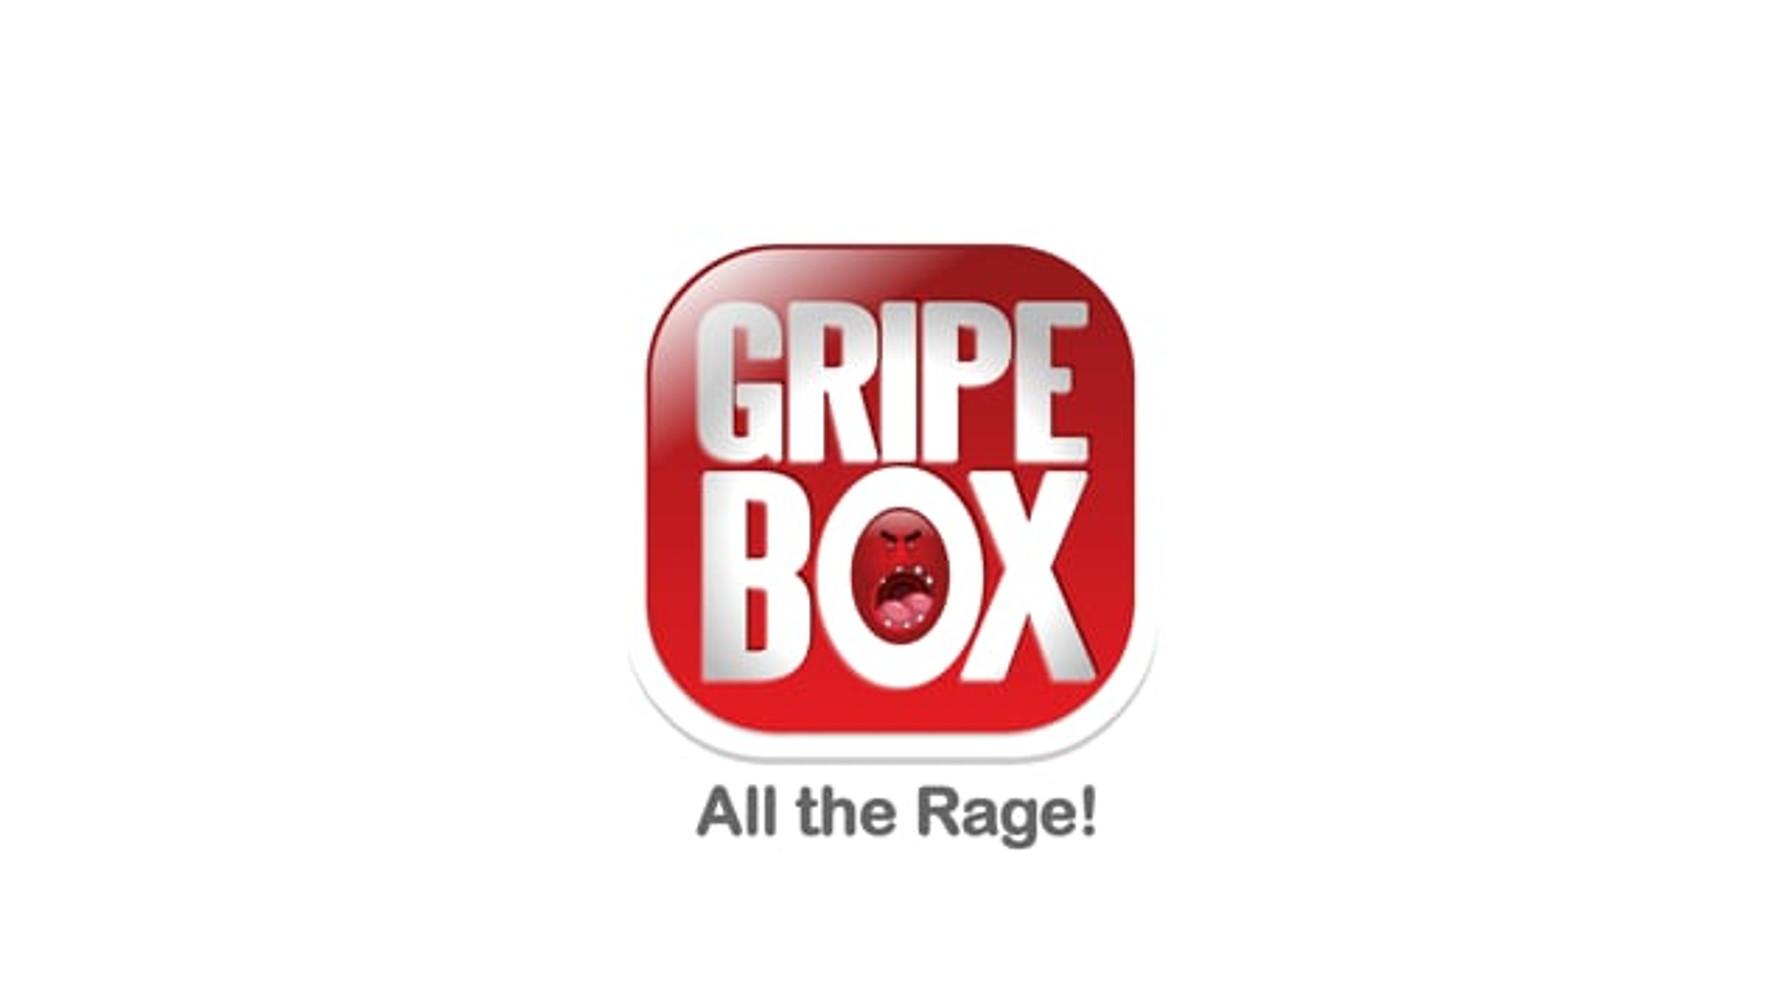 GRIPE BOX